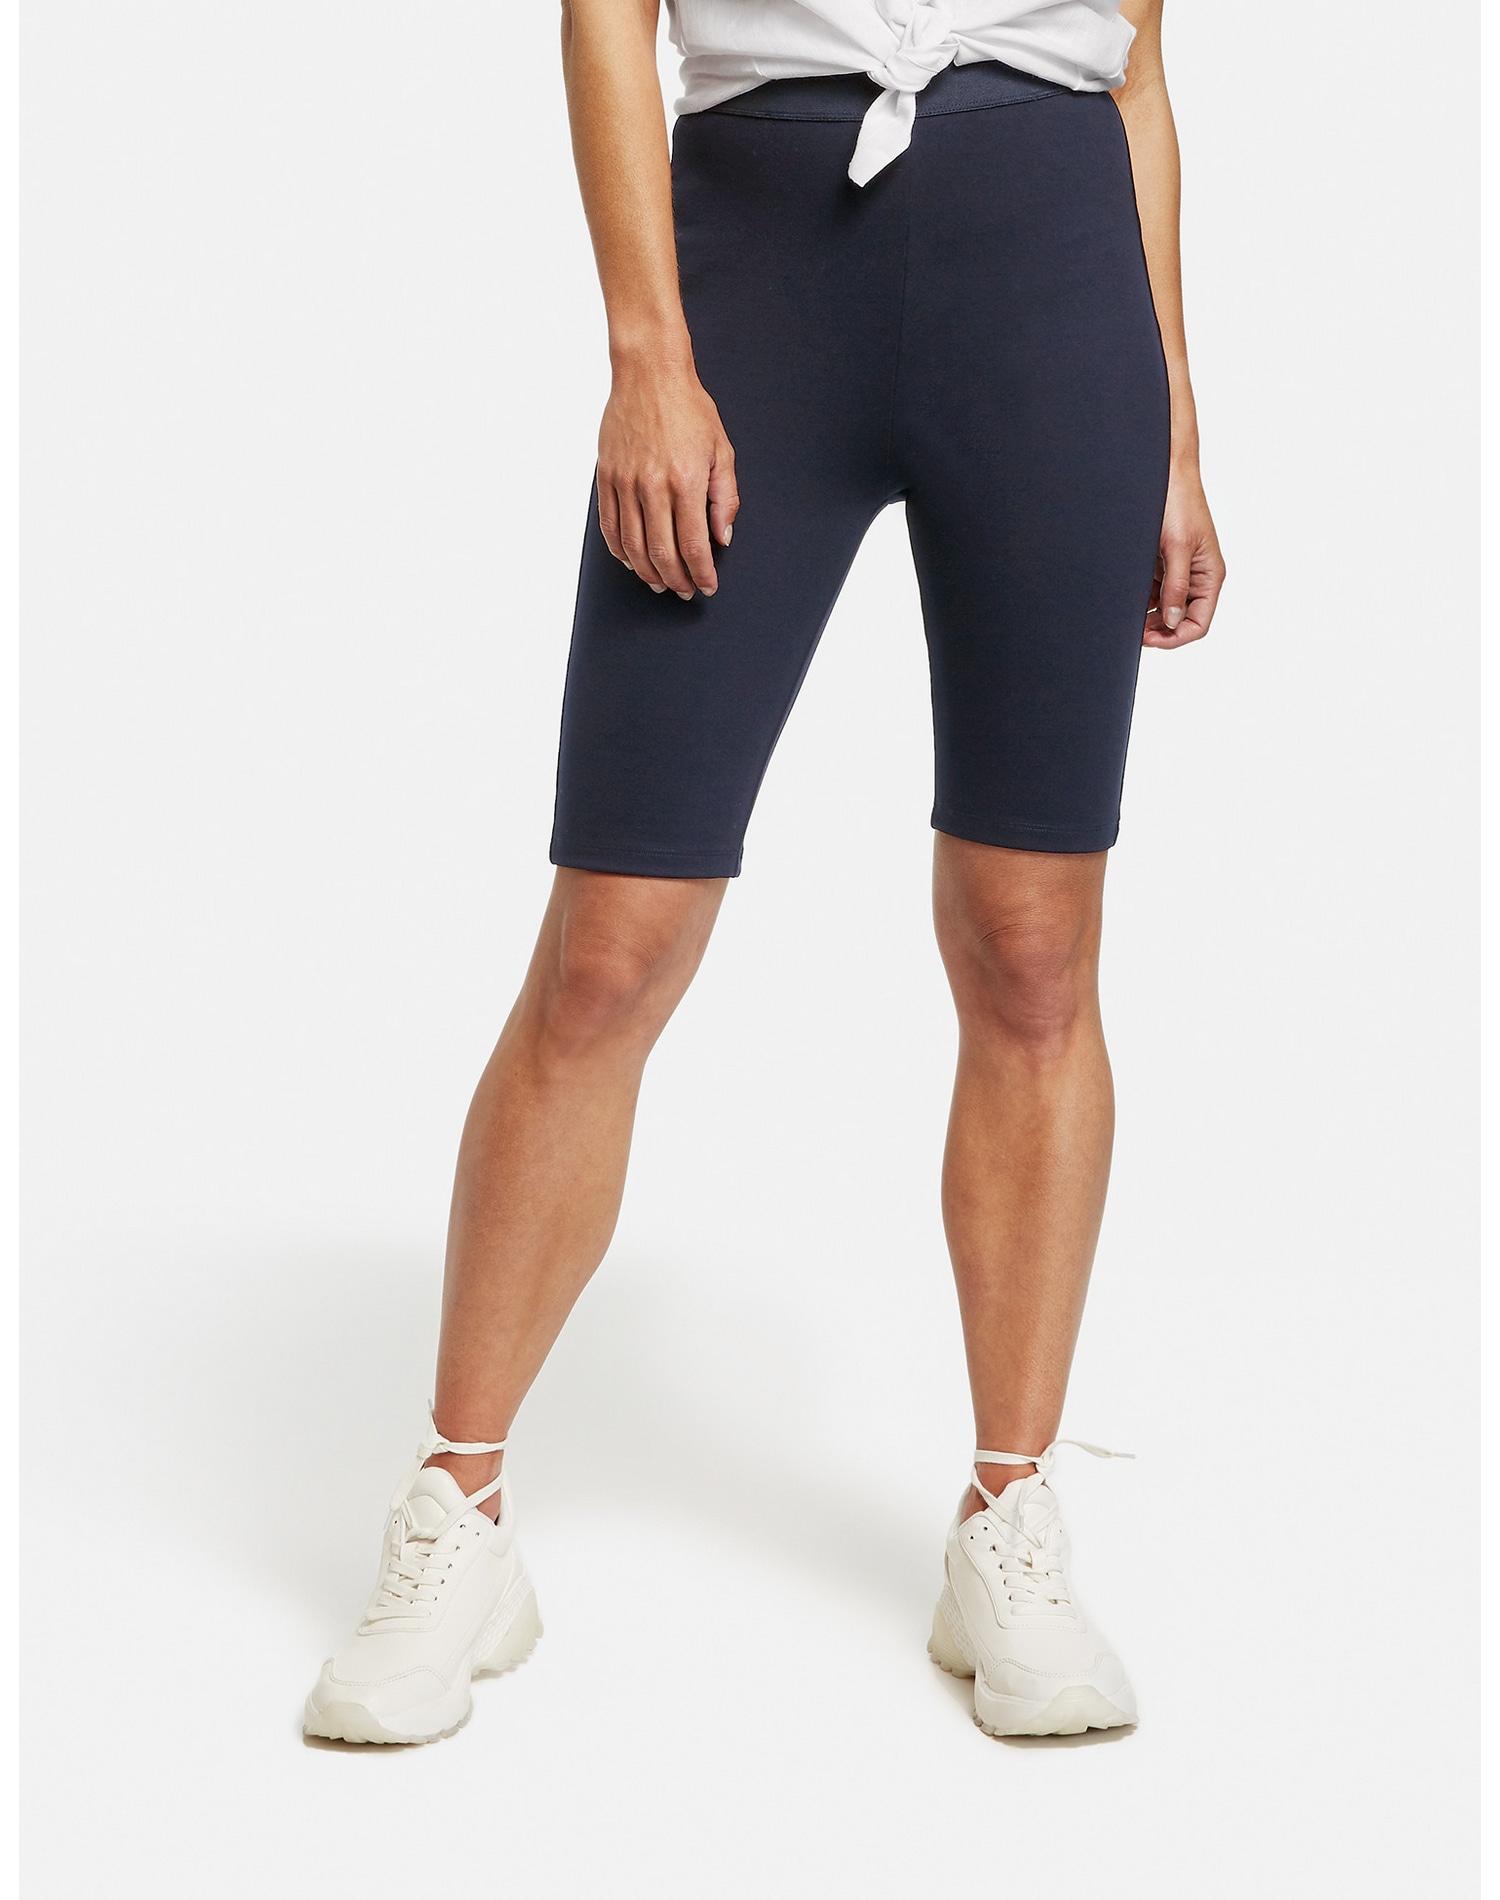 gerry weber -  Hose Gewirke (Legging Jogging etc) Radlerhose aus Jersey